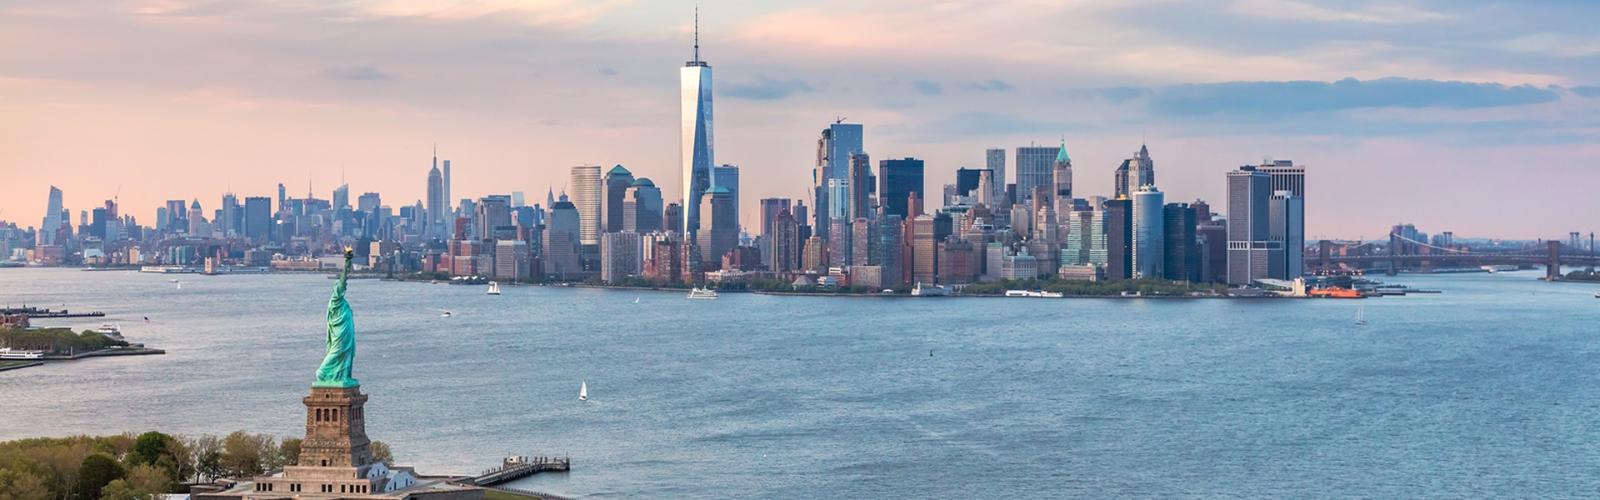 New York Holidays 2020 2021 New York City Breaks Virgin Holidays